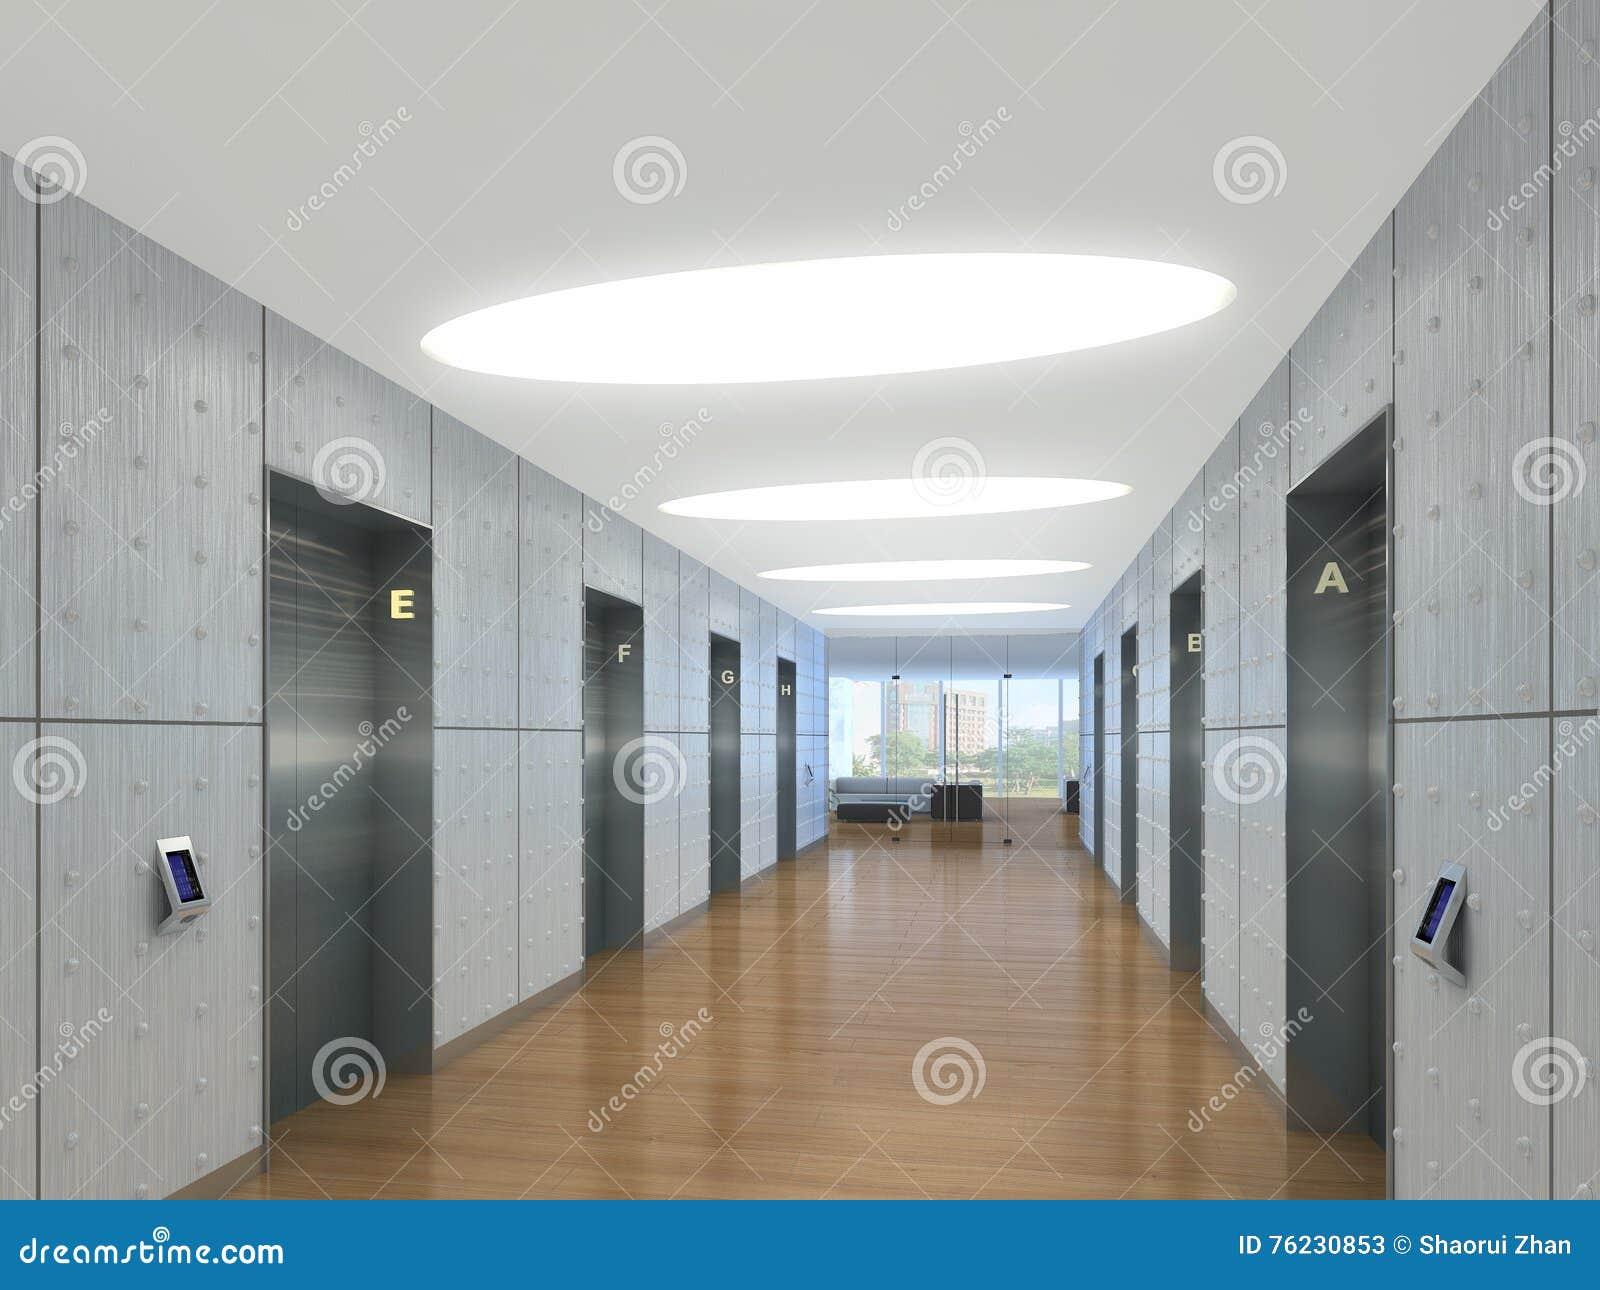 3d illustration of modern elevator lobby stock for Modern elevator design